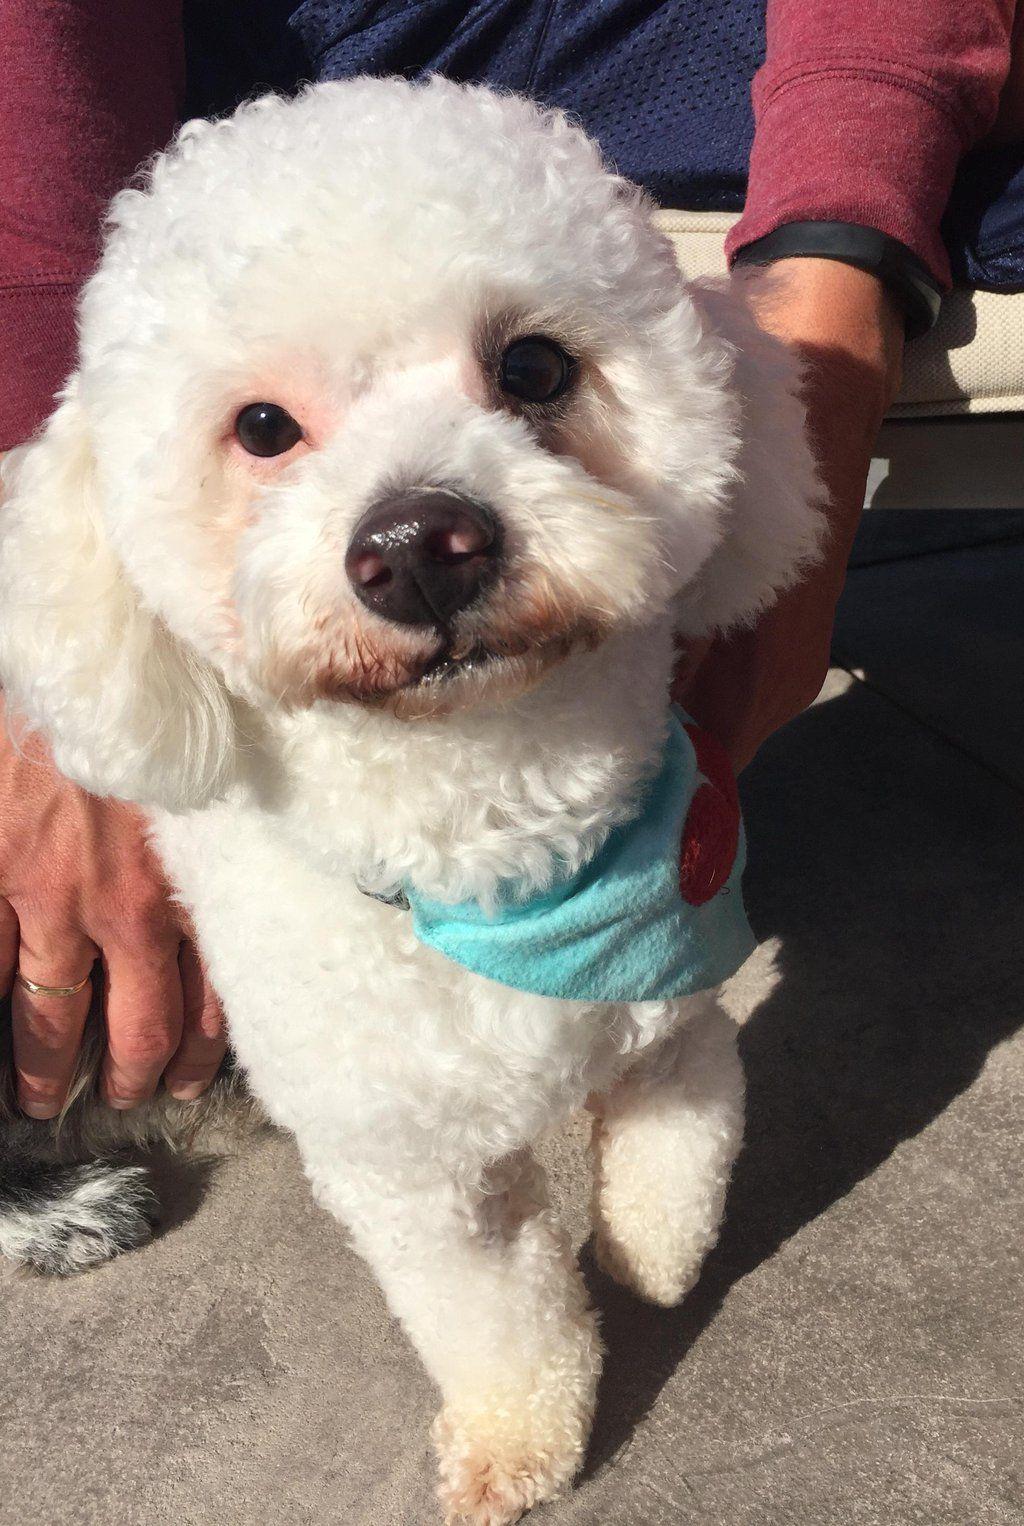 Gayweho Dogs 4 U On Dogs Bichon Frise Pets